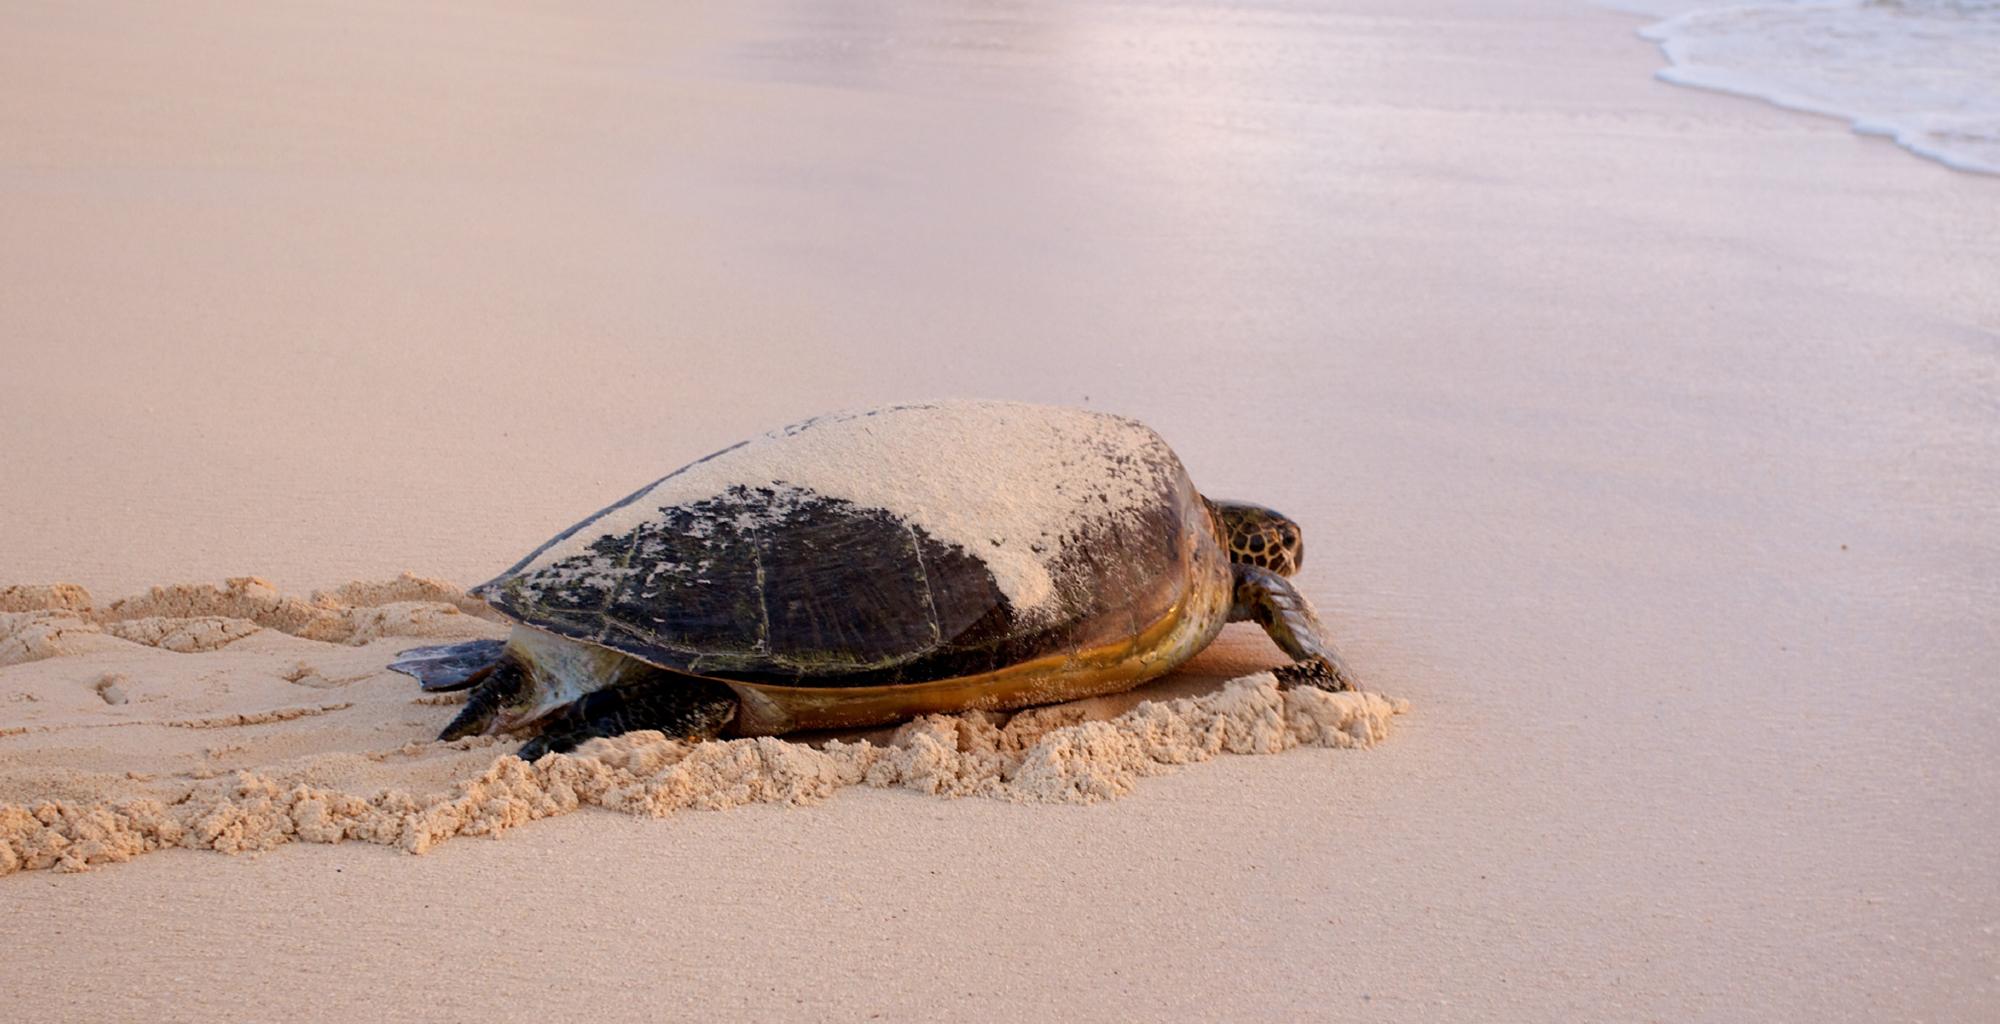 Mozambique-Quirimbas-Vamizi-Lodge-Turtle